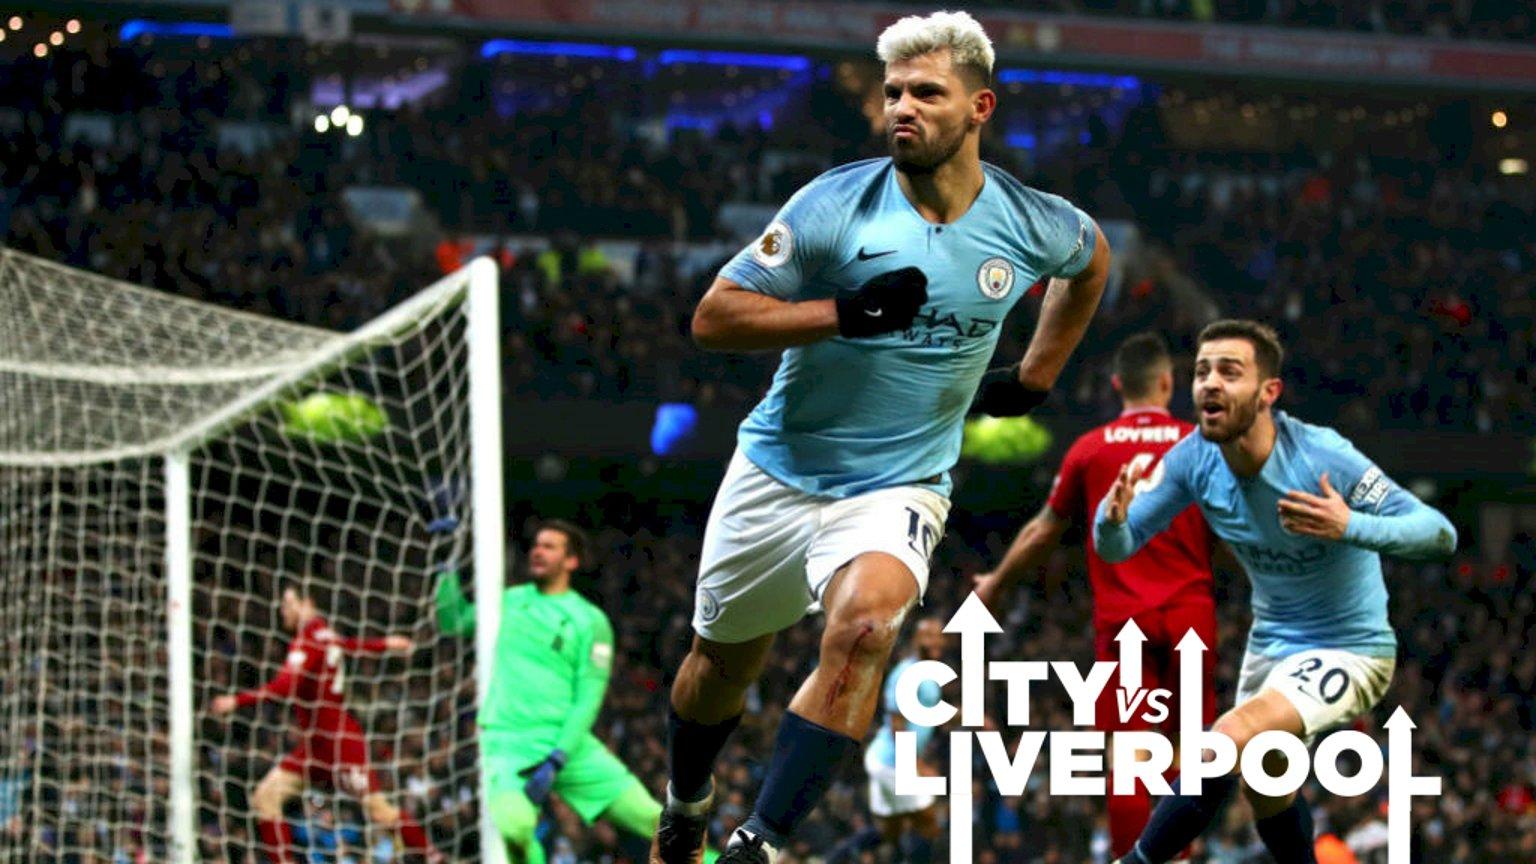 Magnificent City end Liverpool's unbeaten run